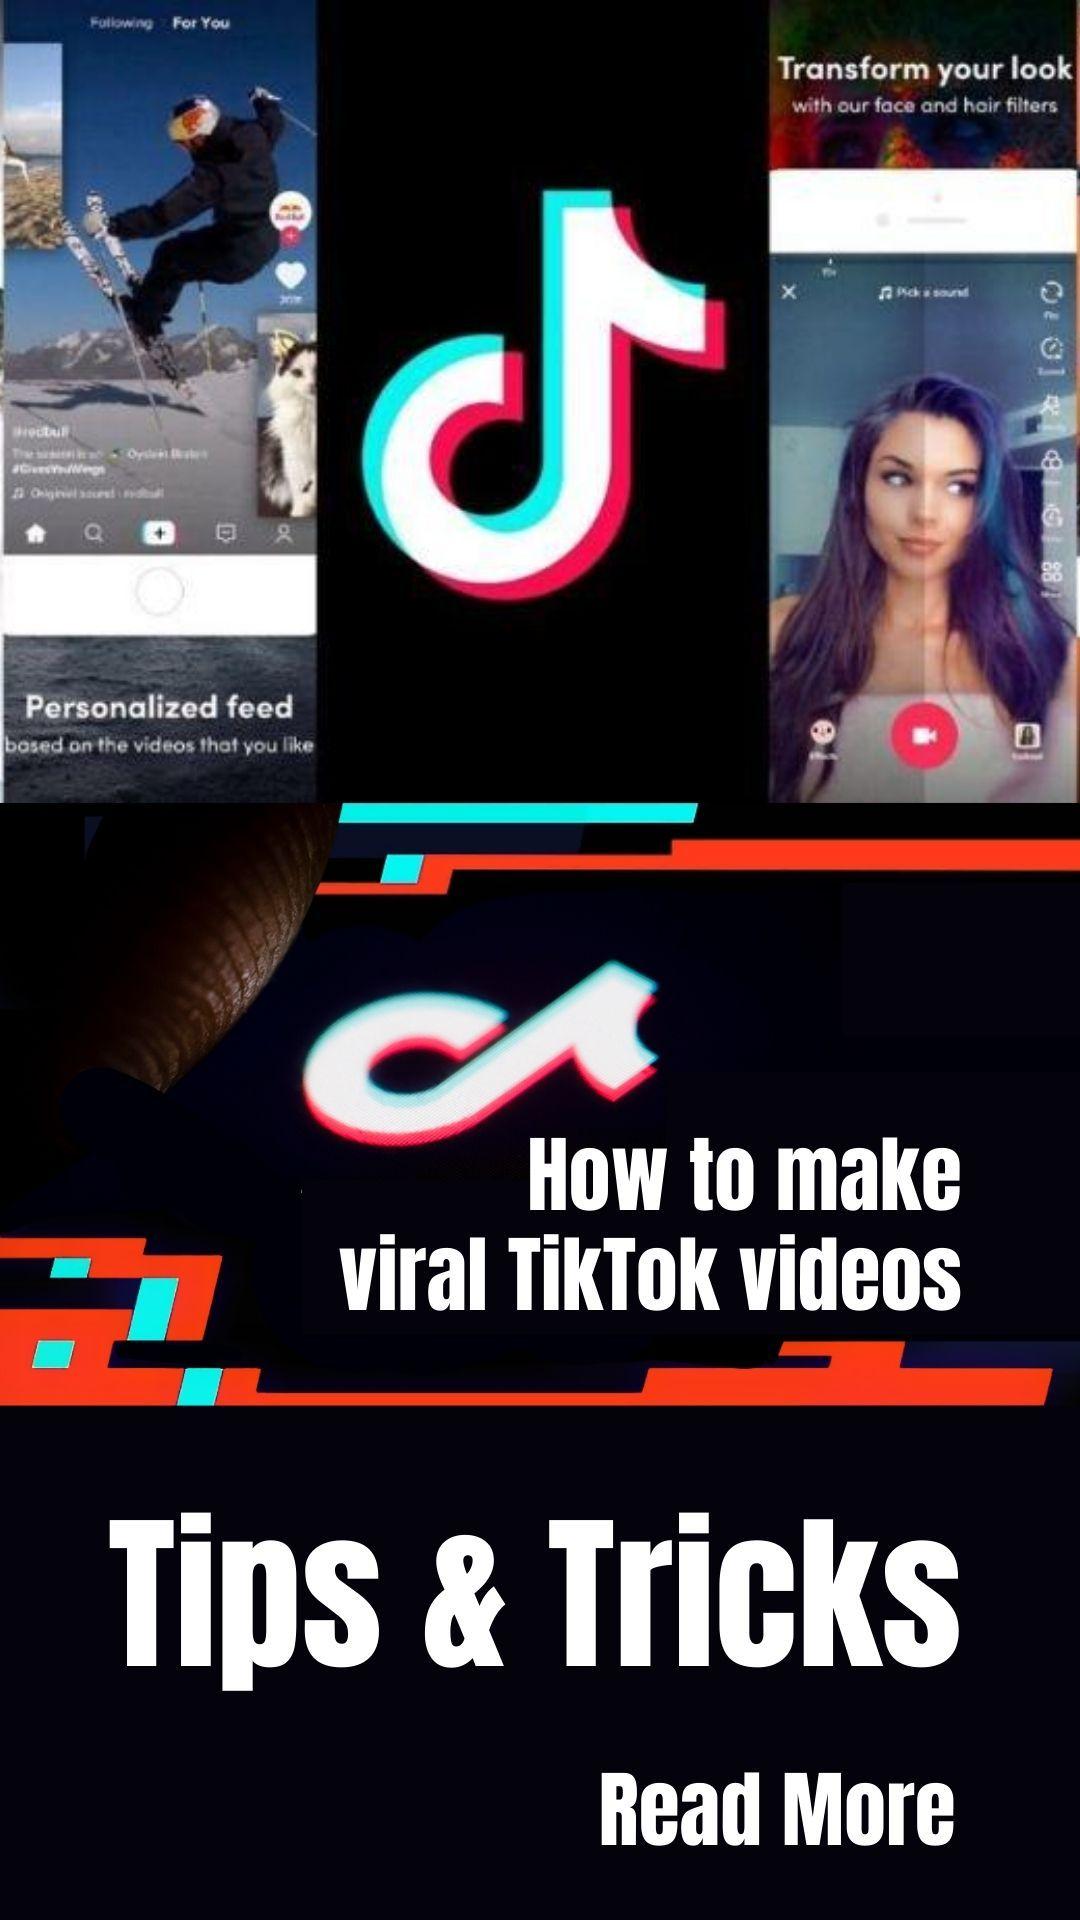 How To Make Viral Tiktok Videos Tips Tricks Viral Videos Tips